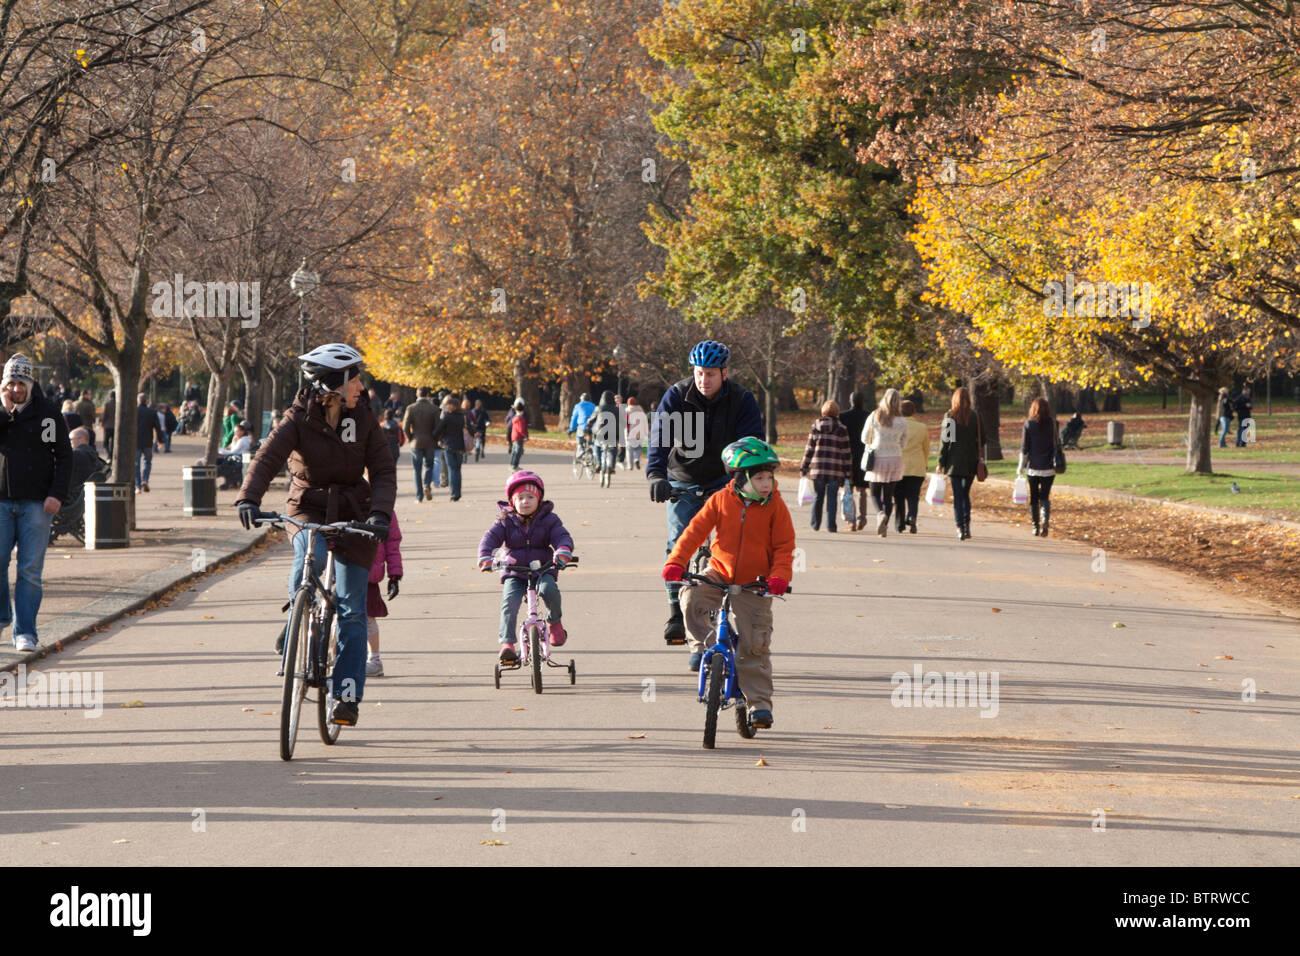 Family bike ride - Hyde Park - London - Stock Image